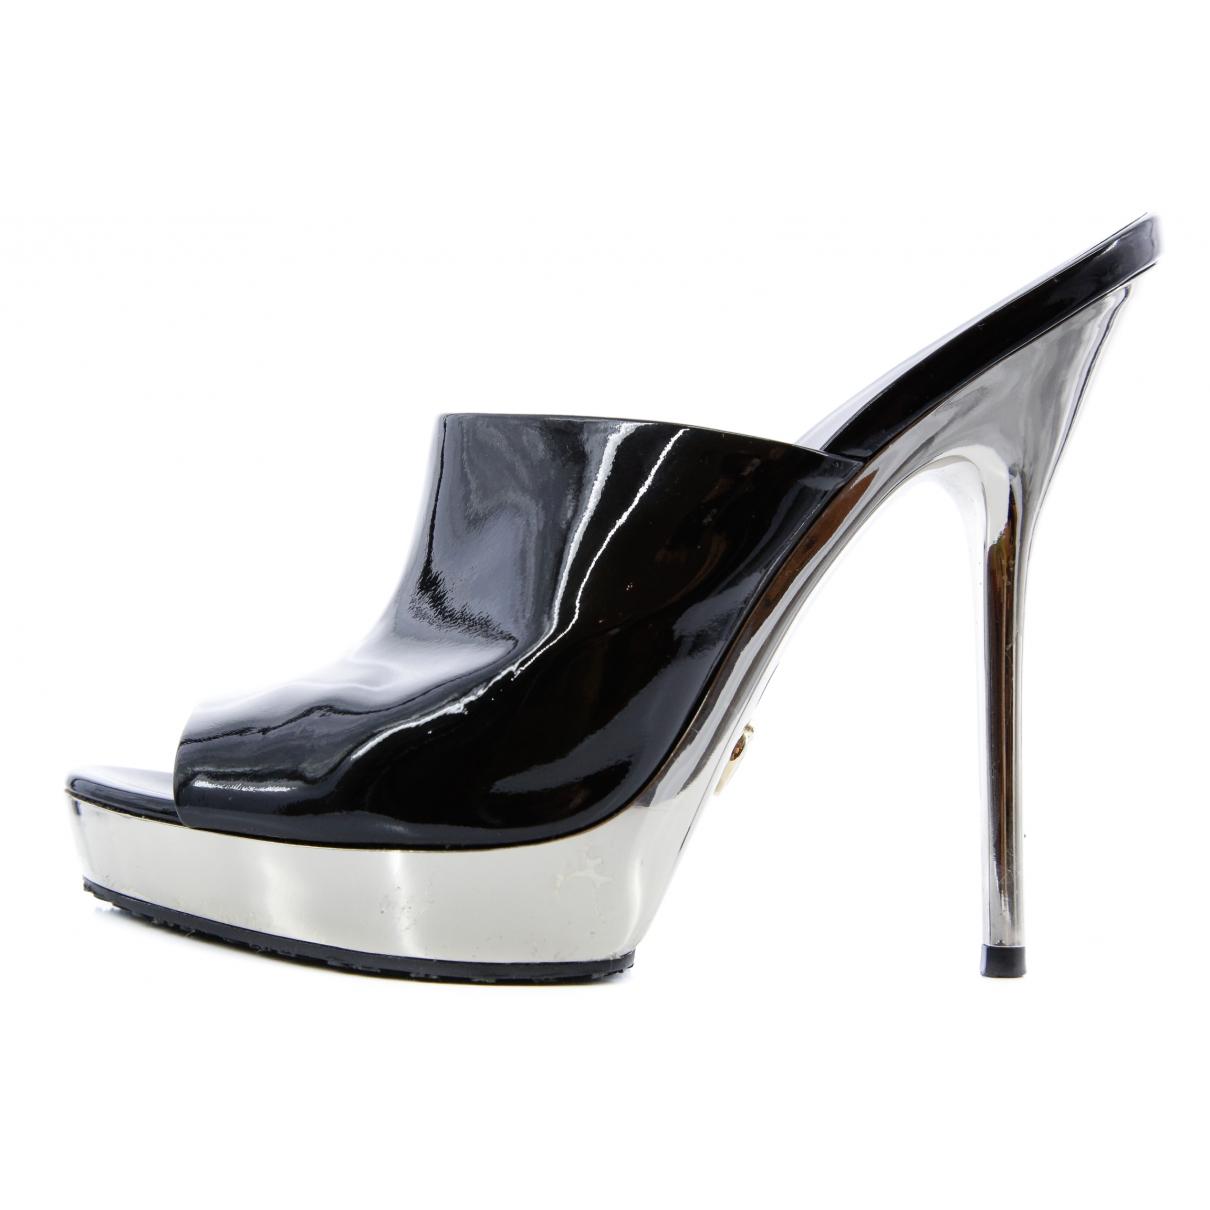 Gucci \N Black Patent leather Mules & Clogs for Women 37 EU